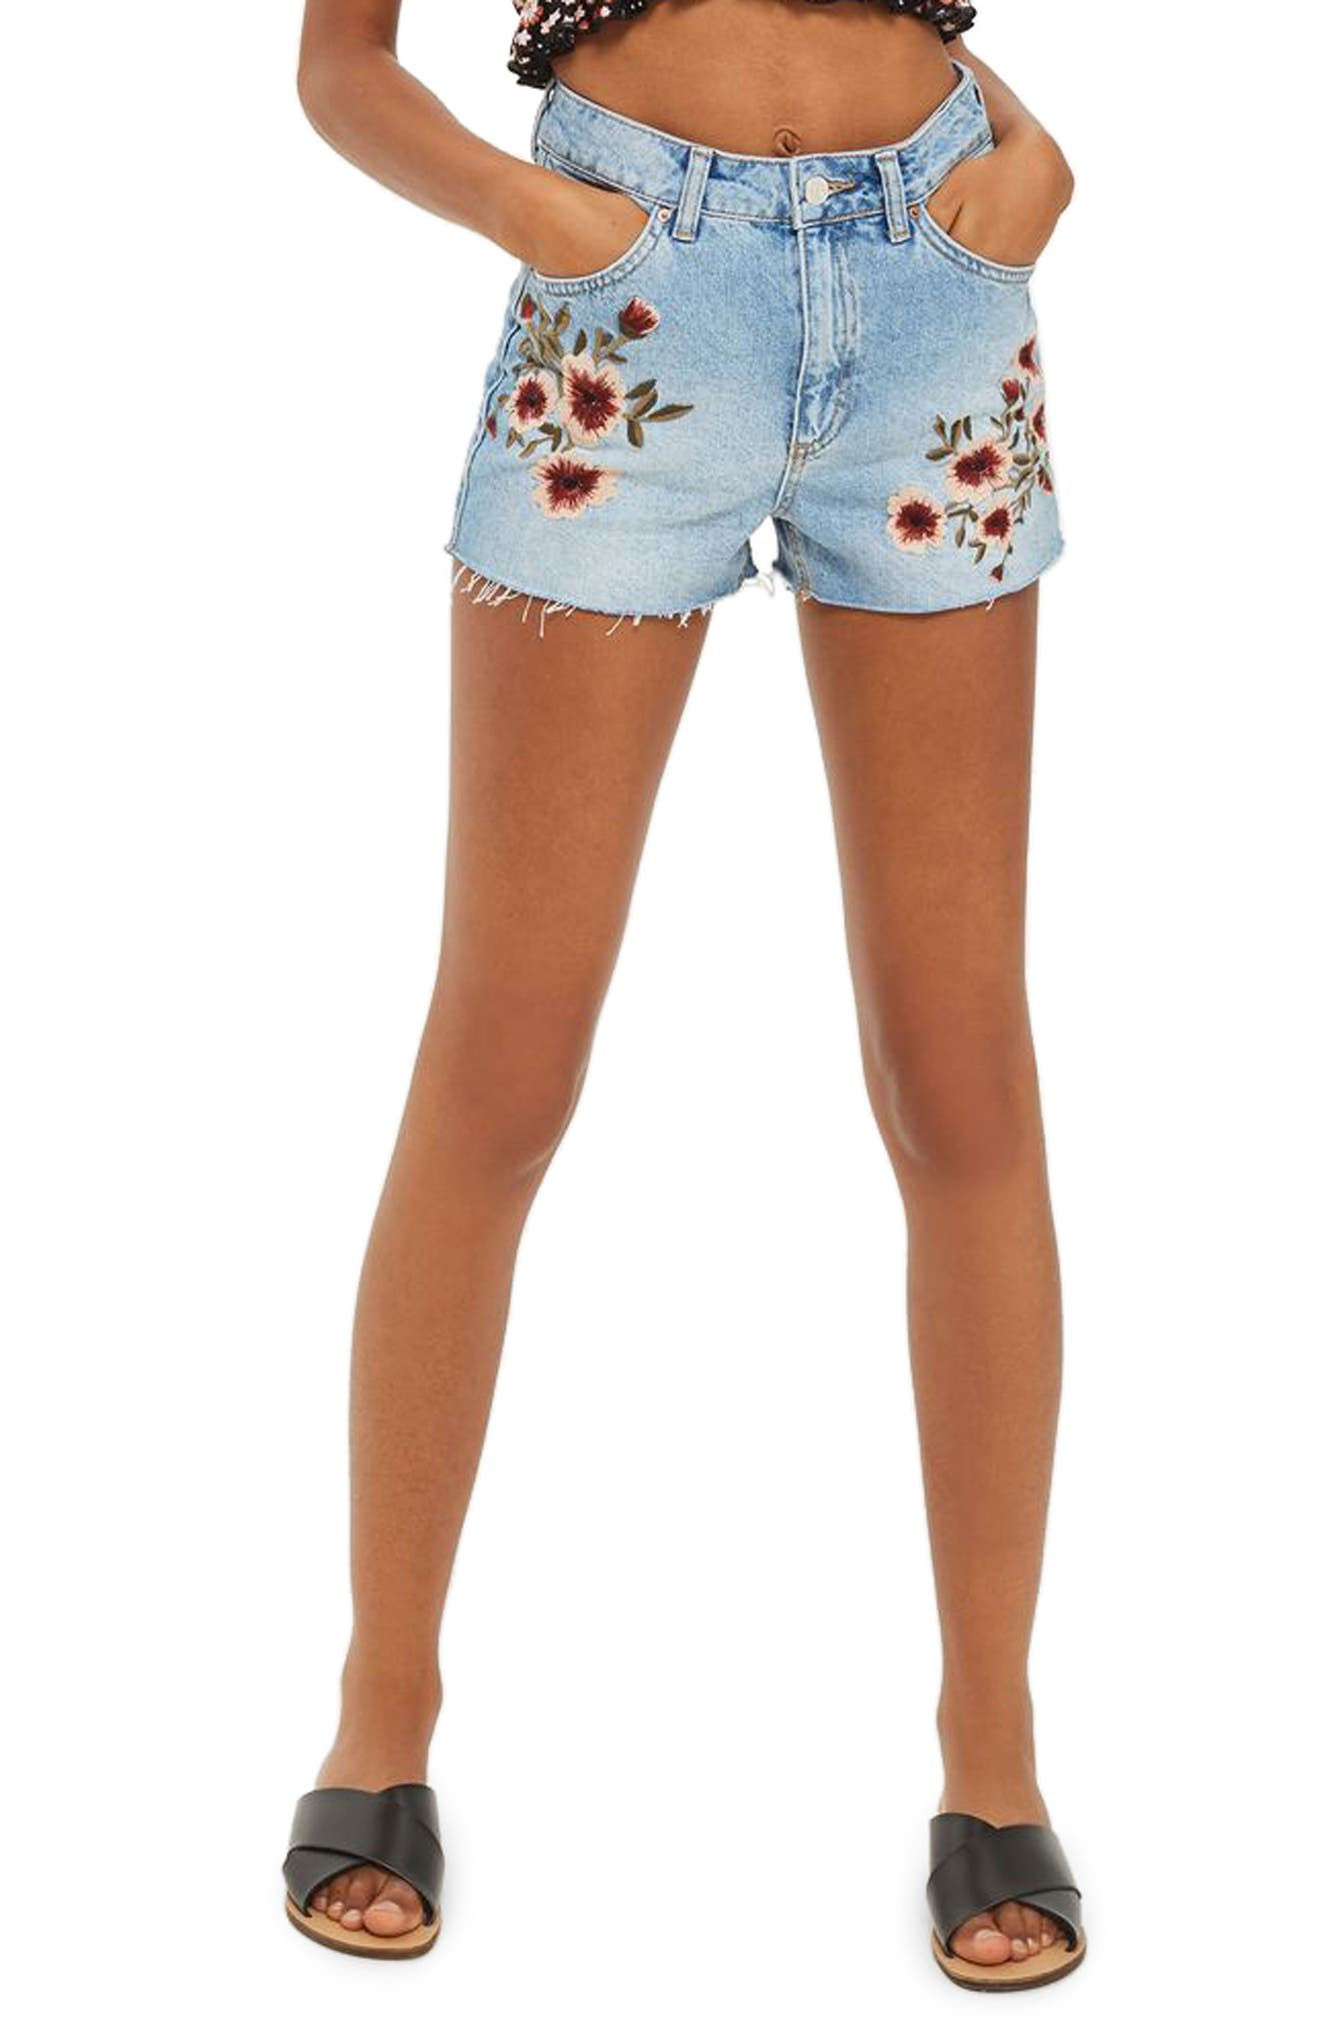 Topshop Blossom Embroidered Denim Mom Shorts